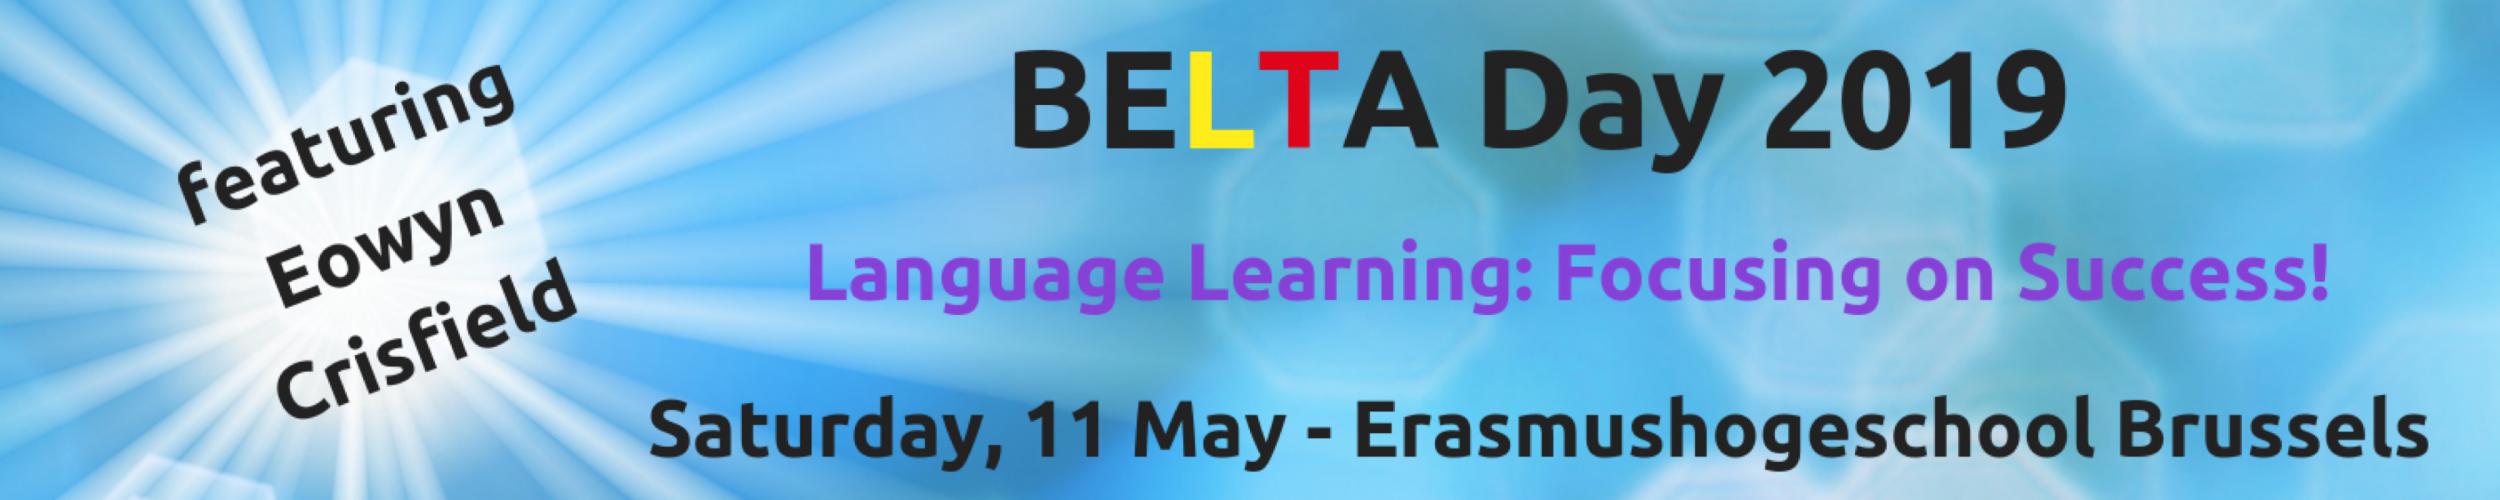 BELTA Day 2019 (new)